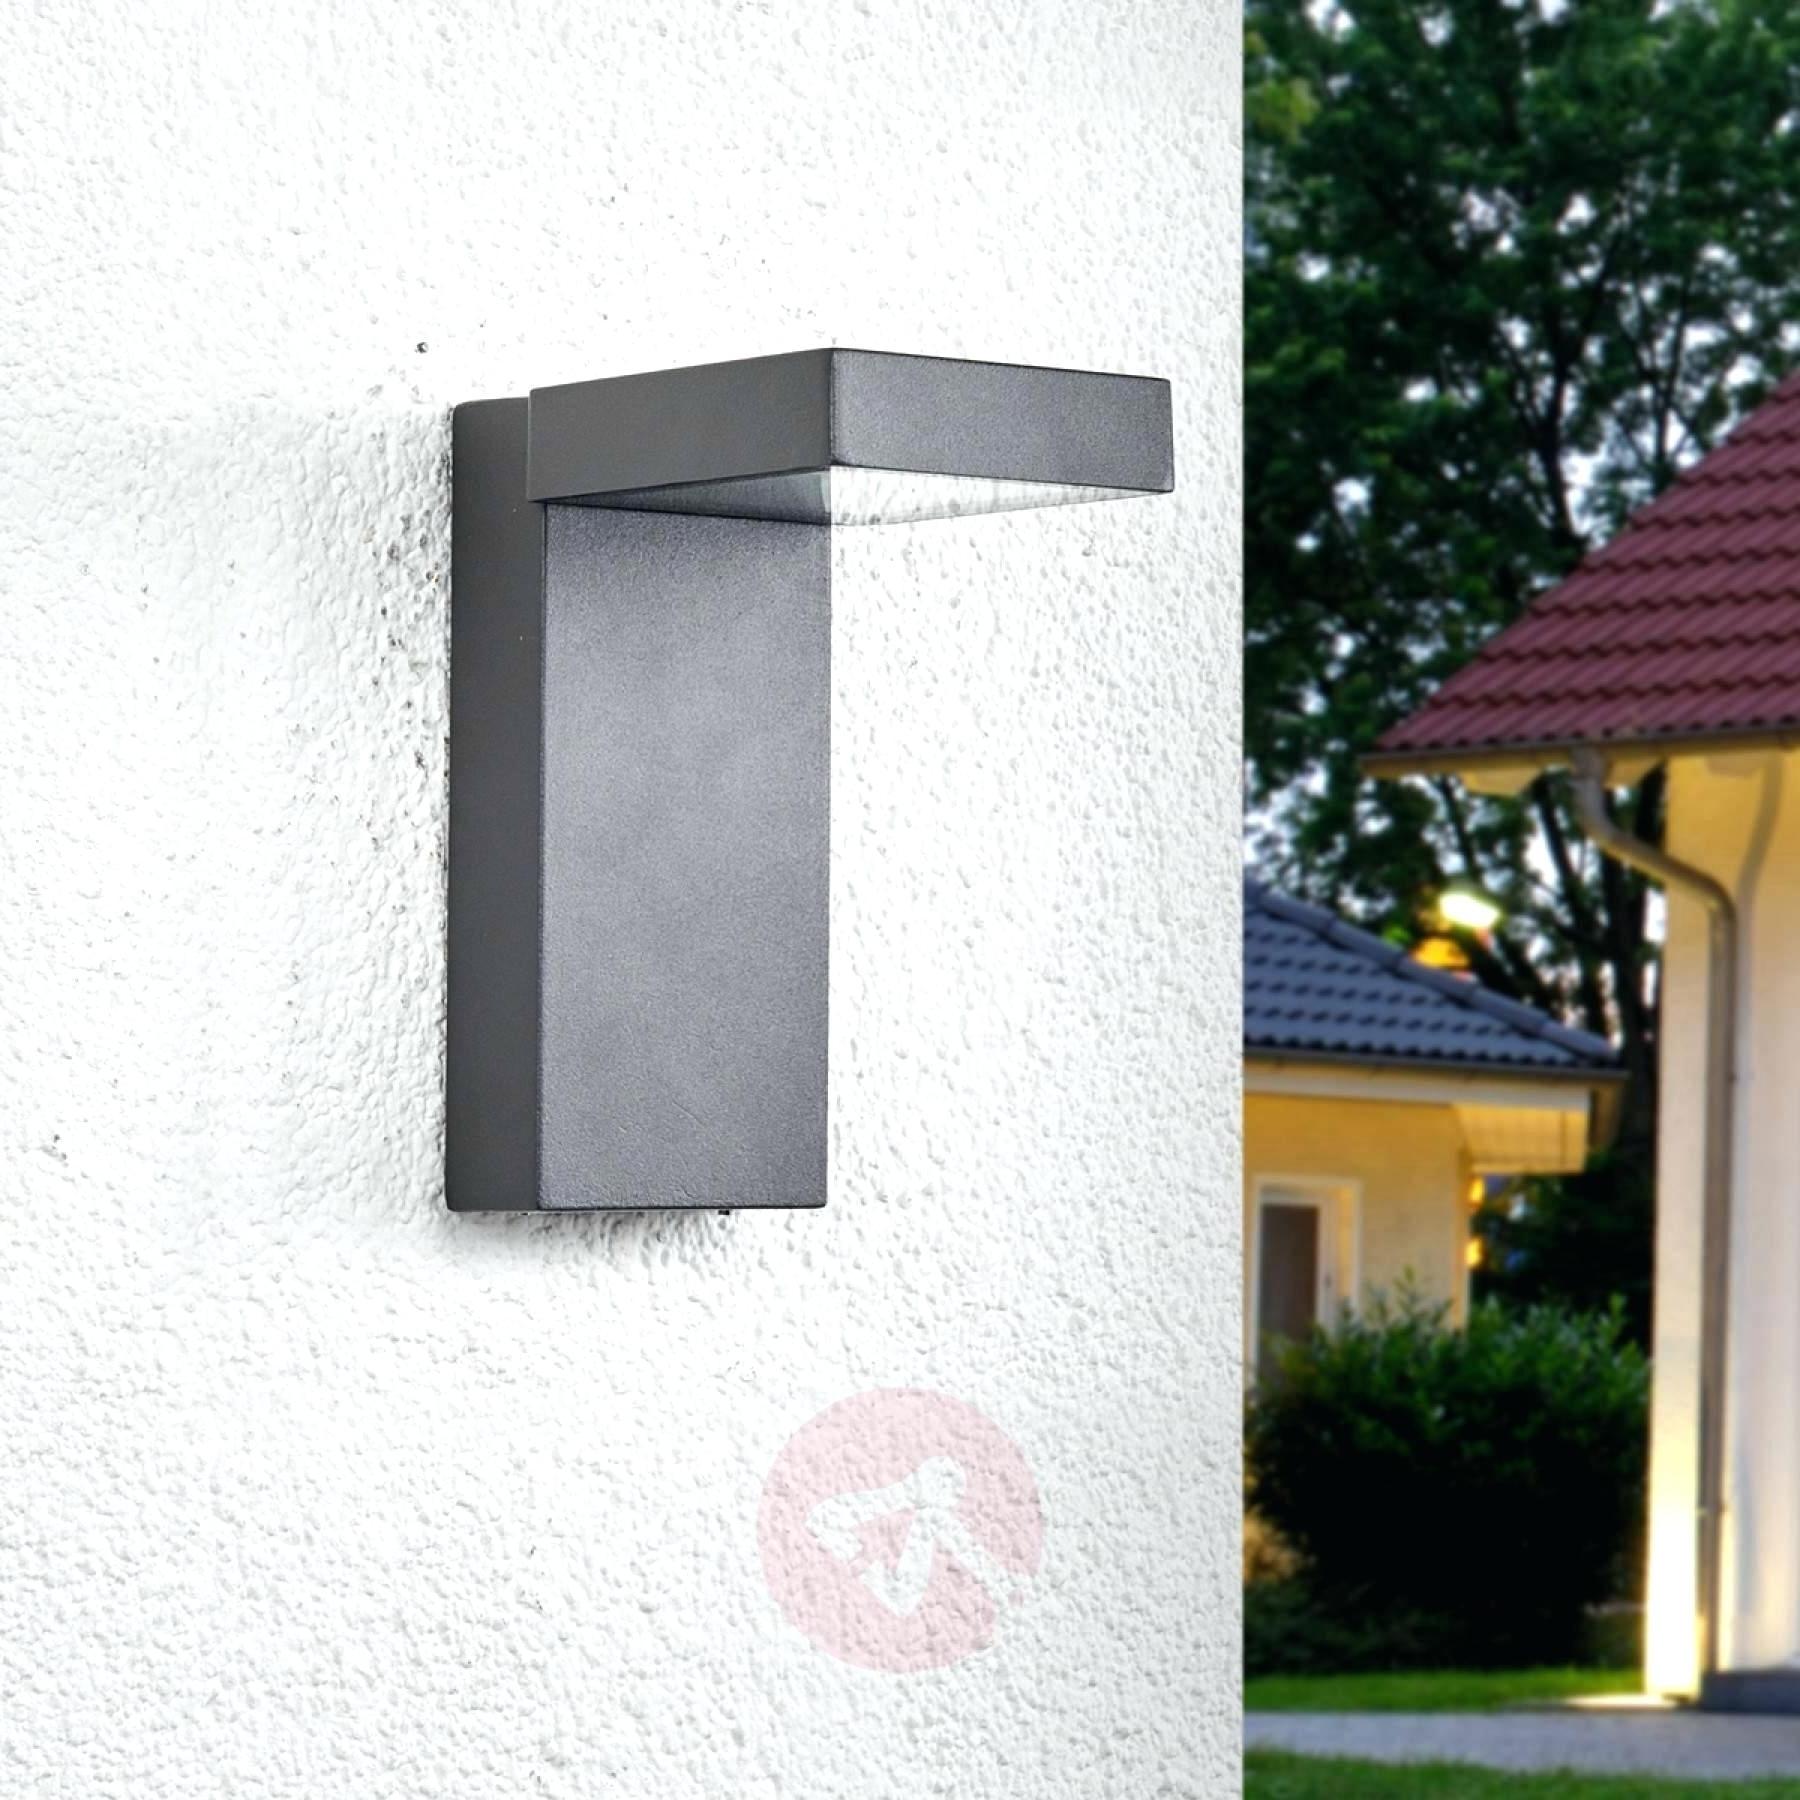 Most Recent Led Outdoor Wall Light – Dlabiura Pertaining To Led Outdoor Wall Lights Lanea With Motion Sensor (View 12 of 20)